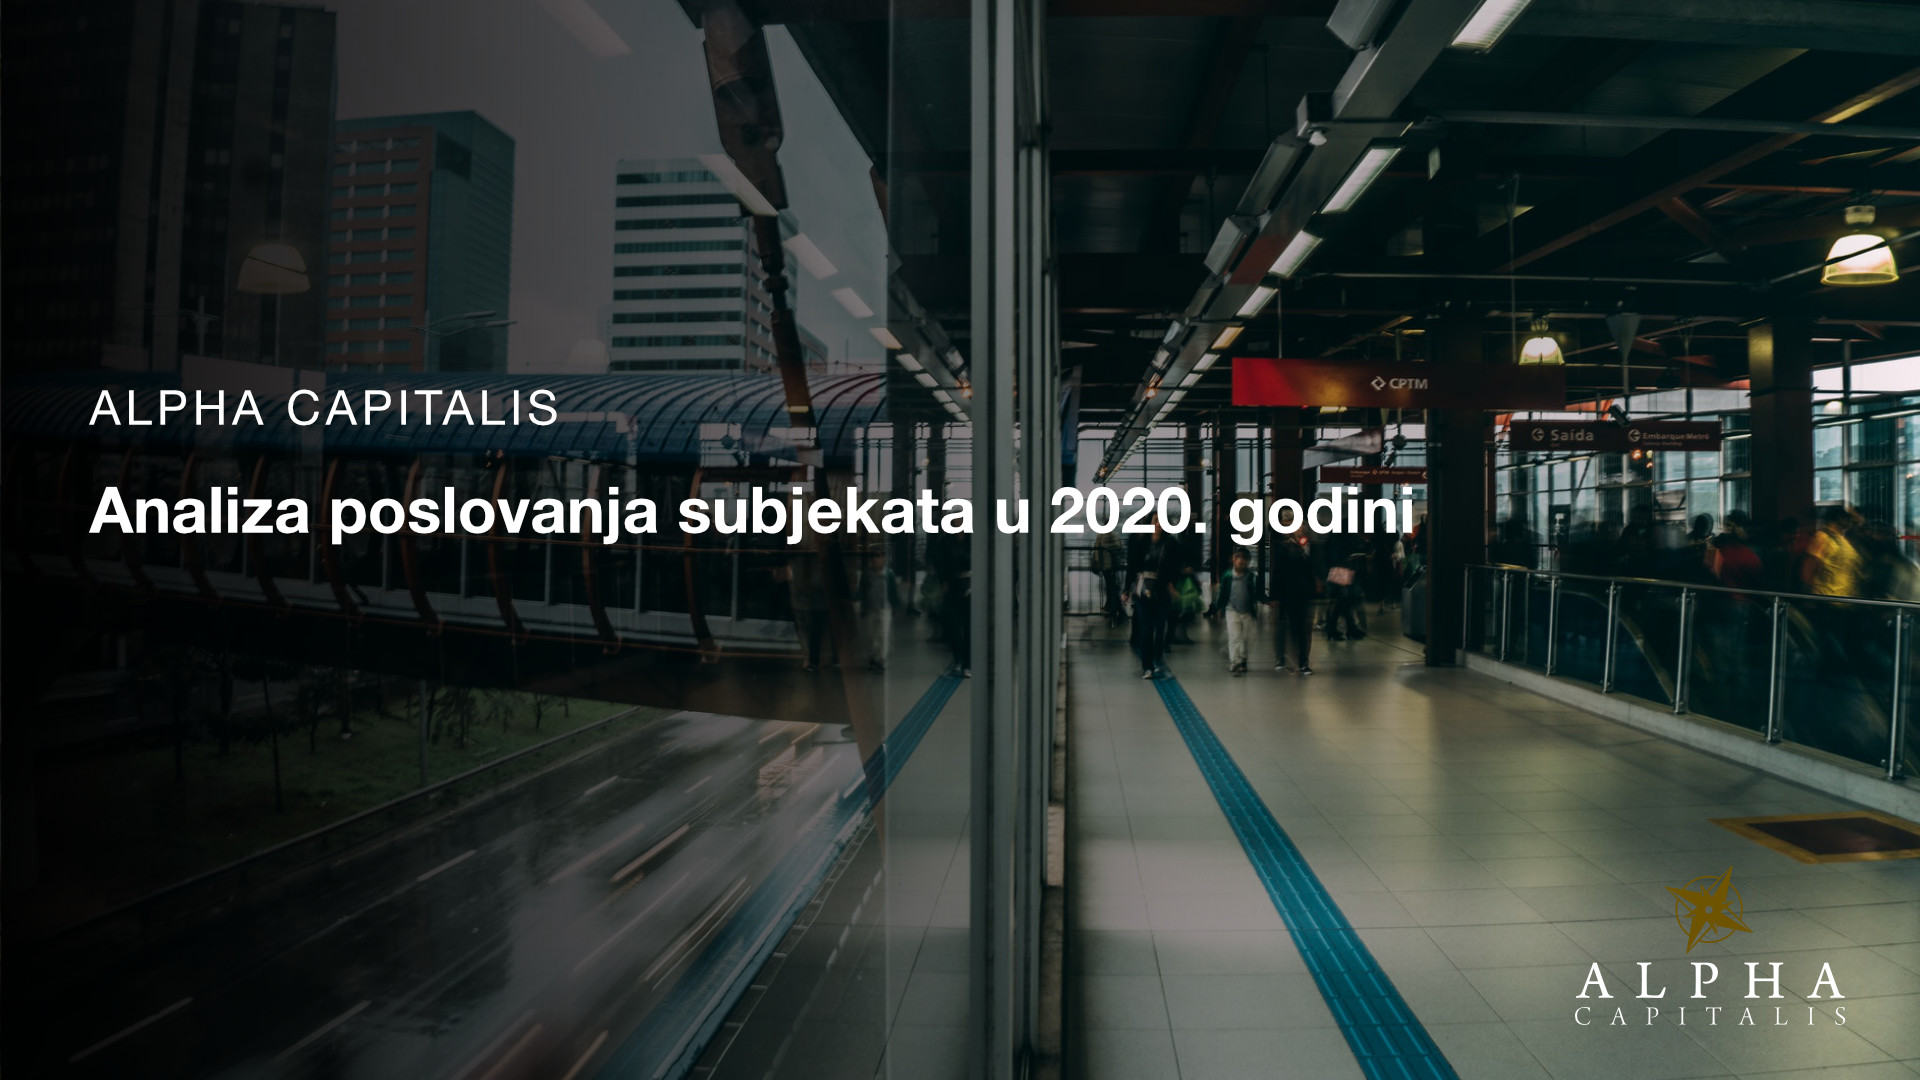 Analiza poslovanja subjekata u 2020. godini